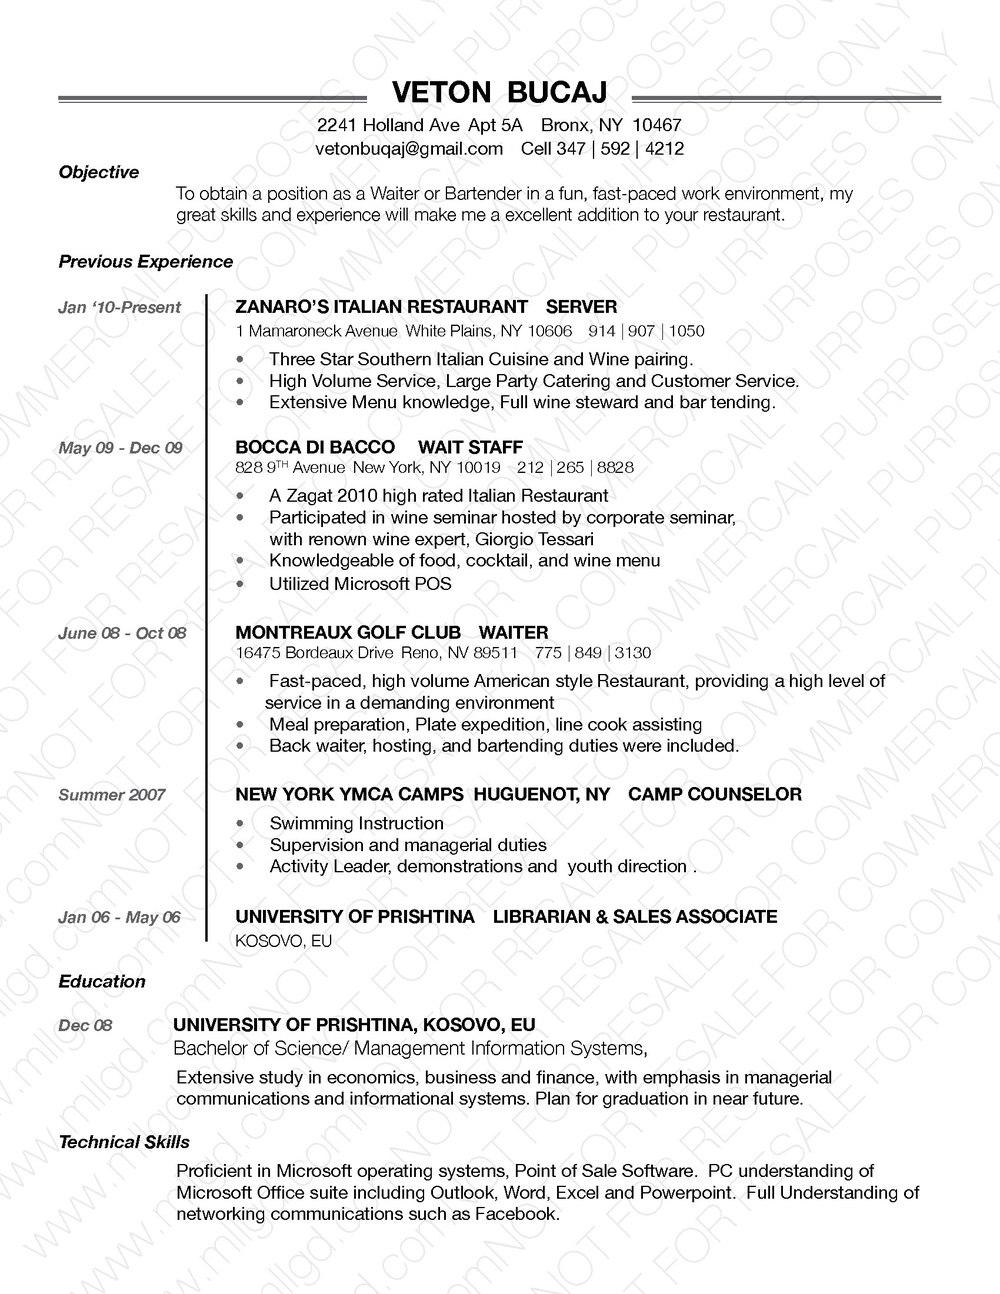 MLL_Resume_Design_2014_Page_25.jpg